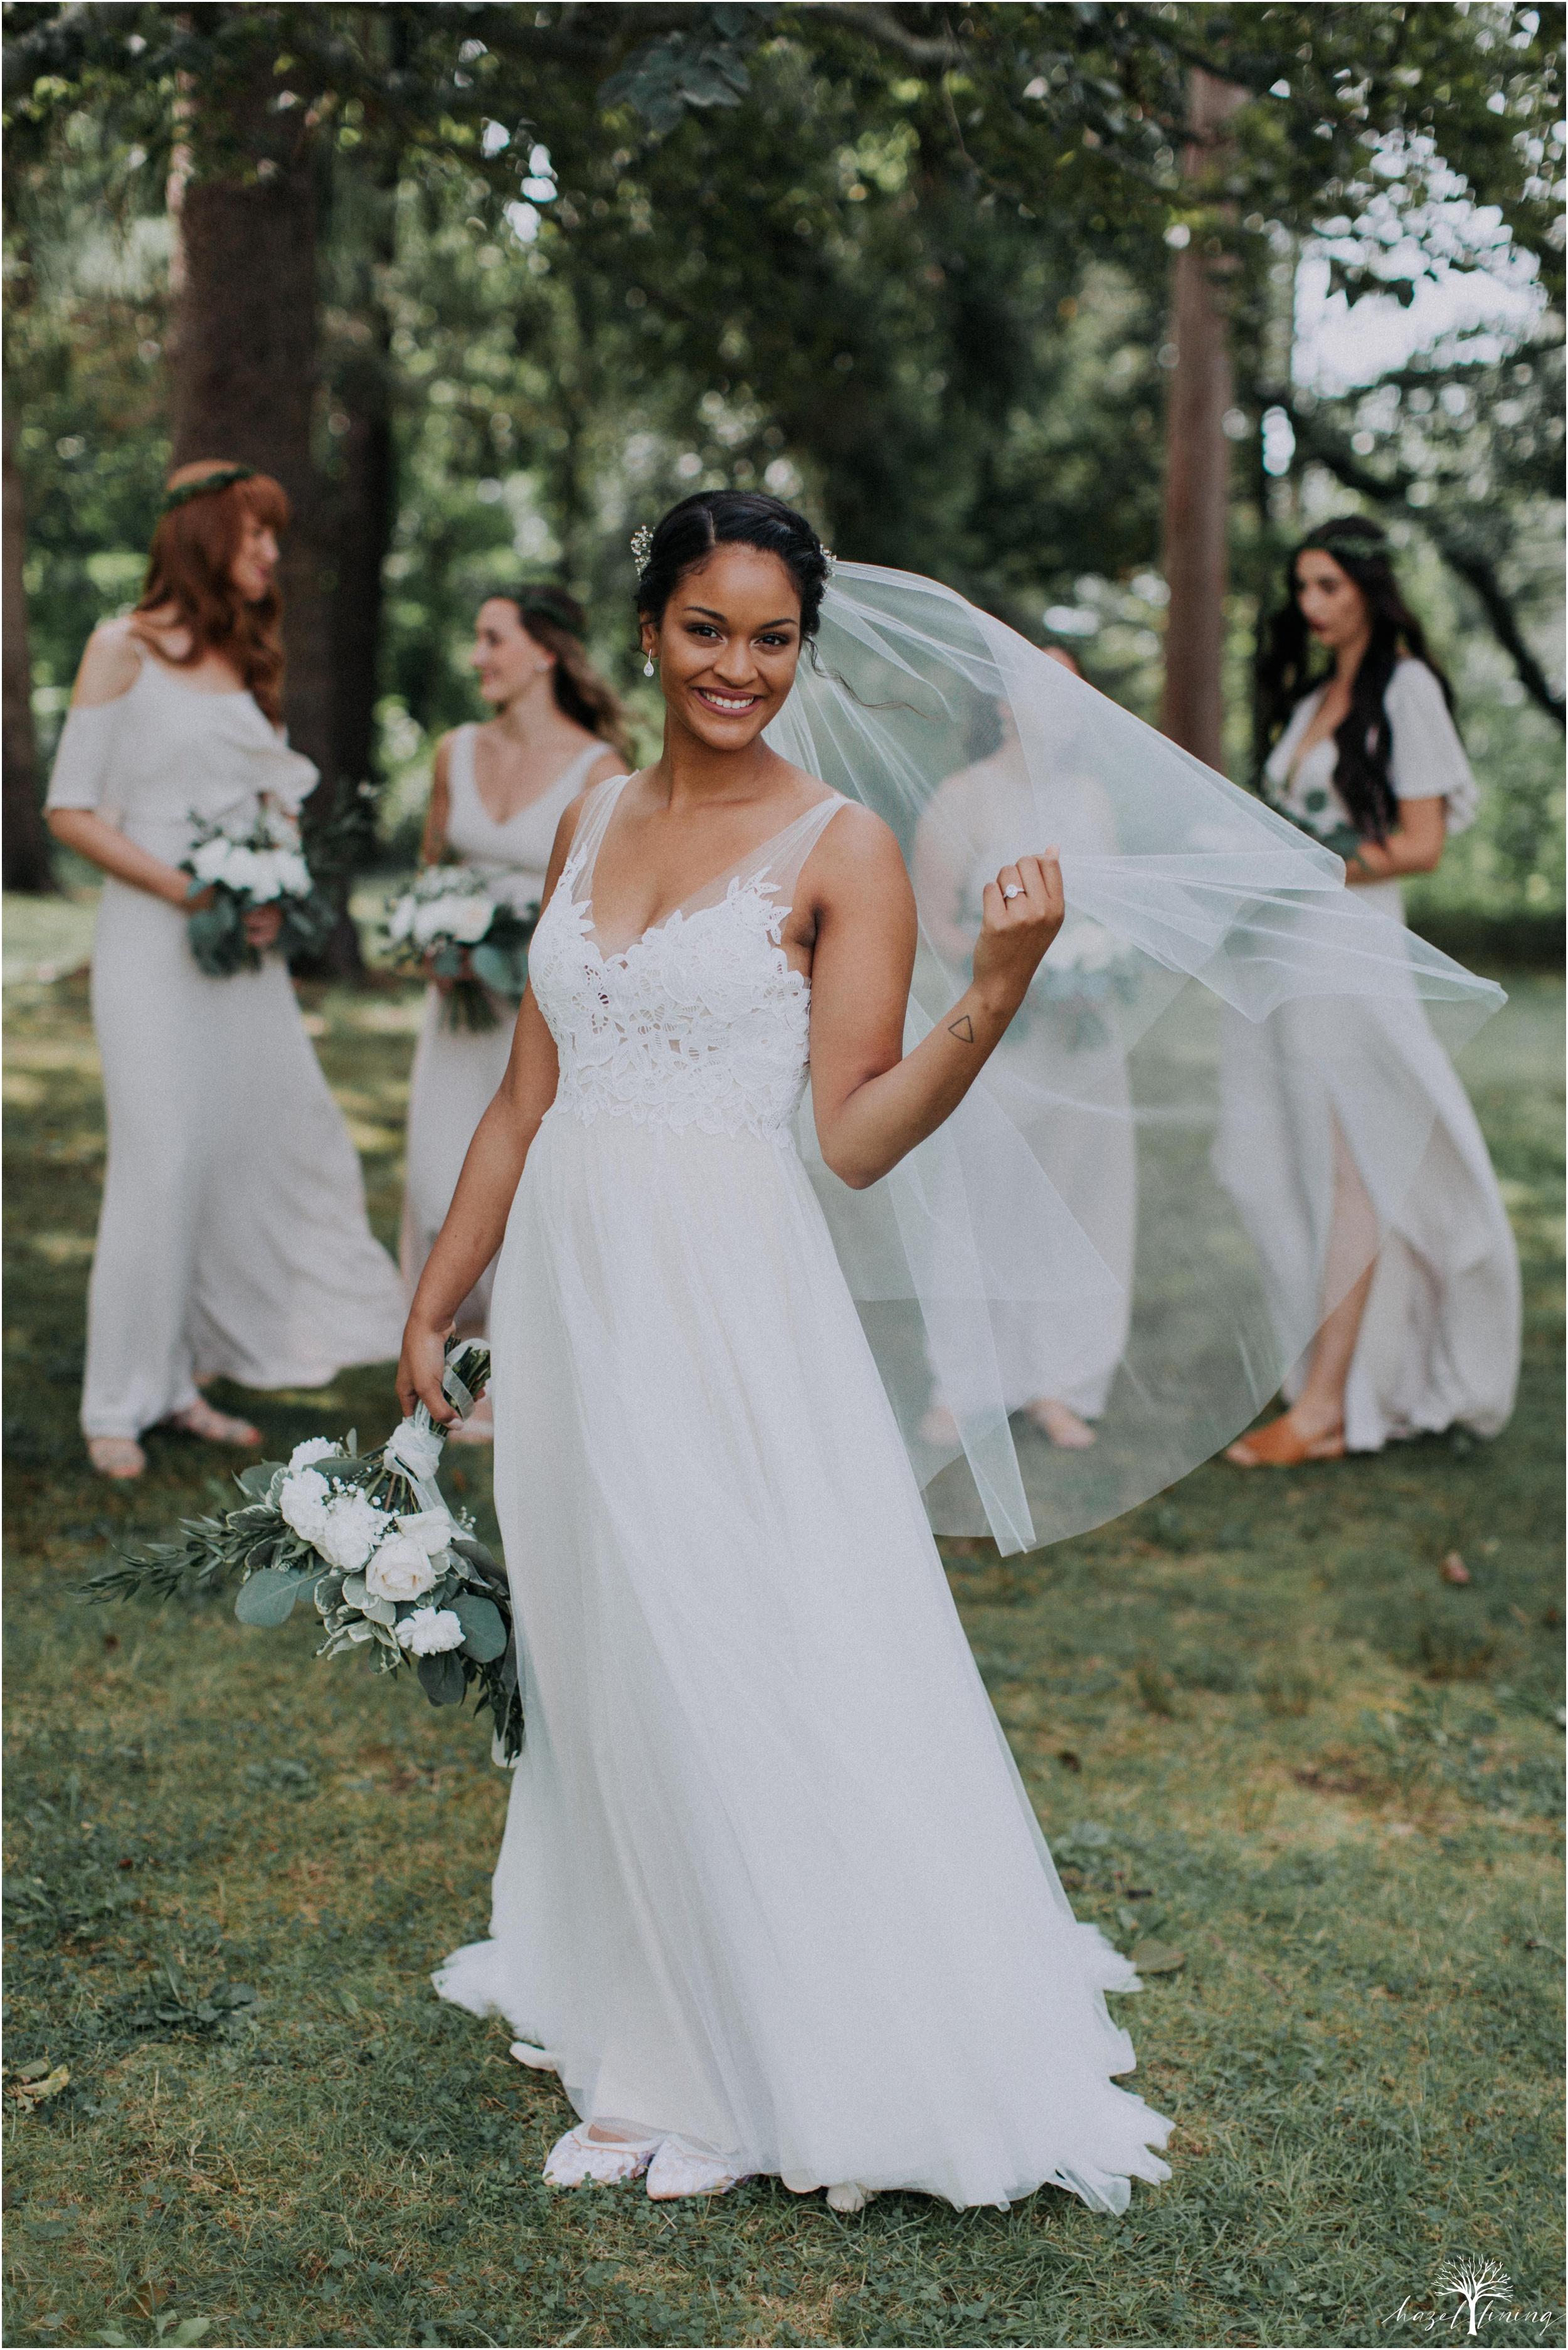 mariah-kreyling-samuel-sherratt-sherrattwiththeworld-peirce-farm-at-witch-hill-boston-massachusetts-wedding-photography-hazel-lining-travel-wedding-elopement-photography_0038.jpg